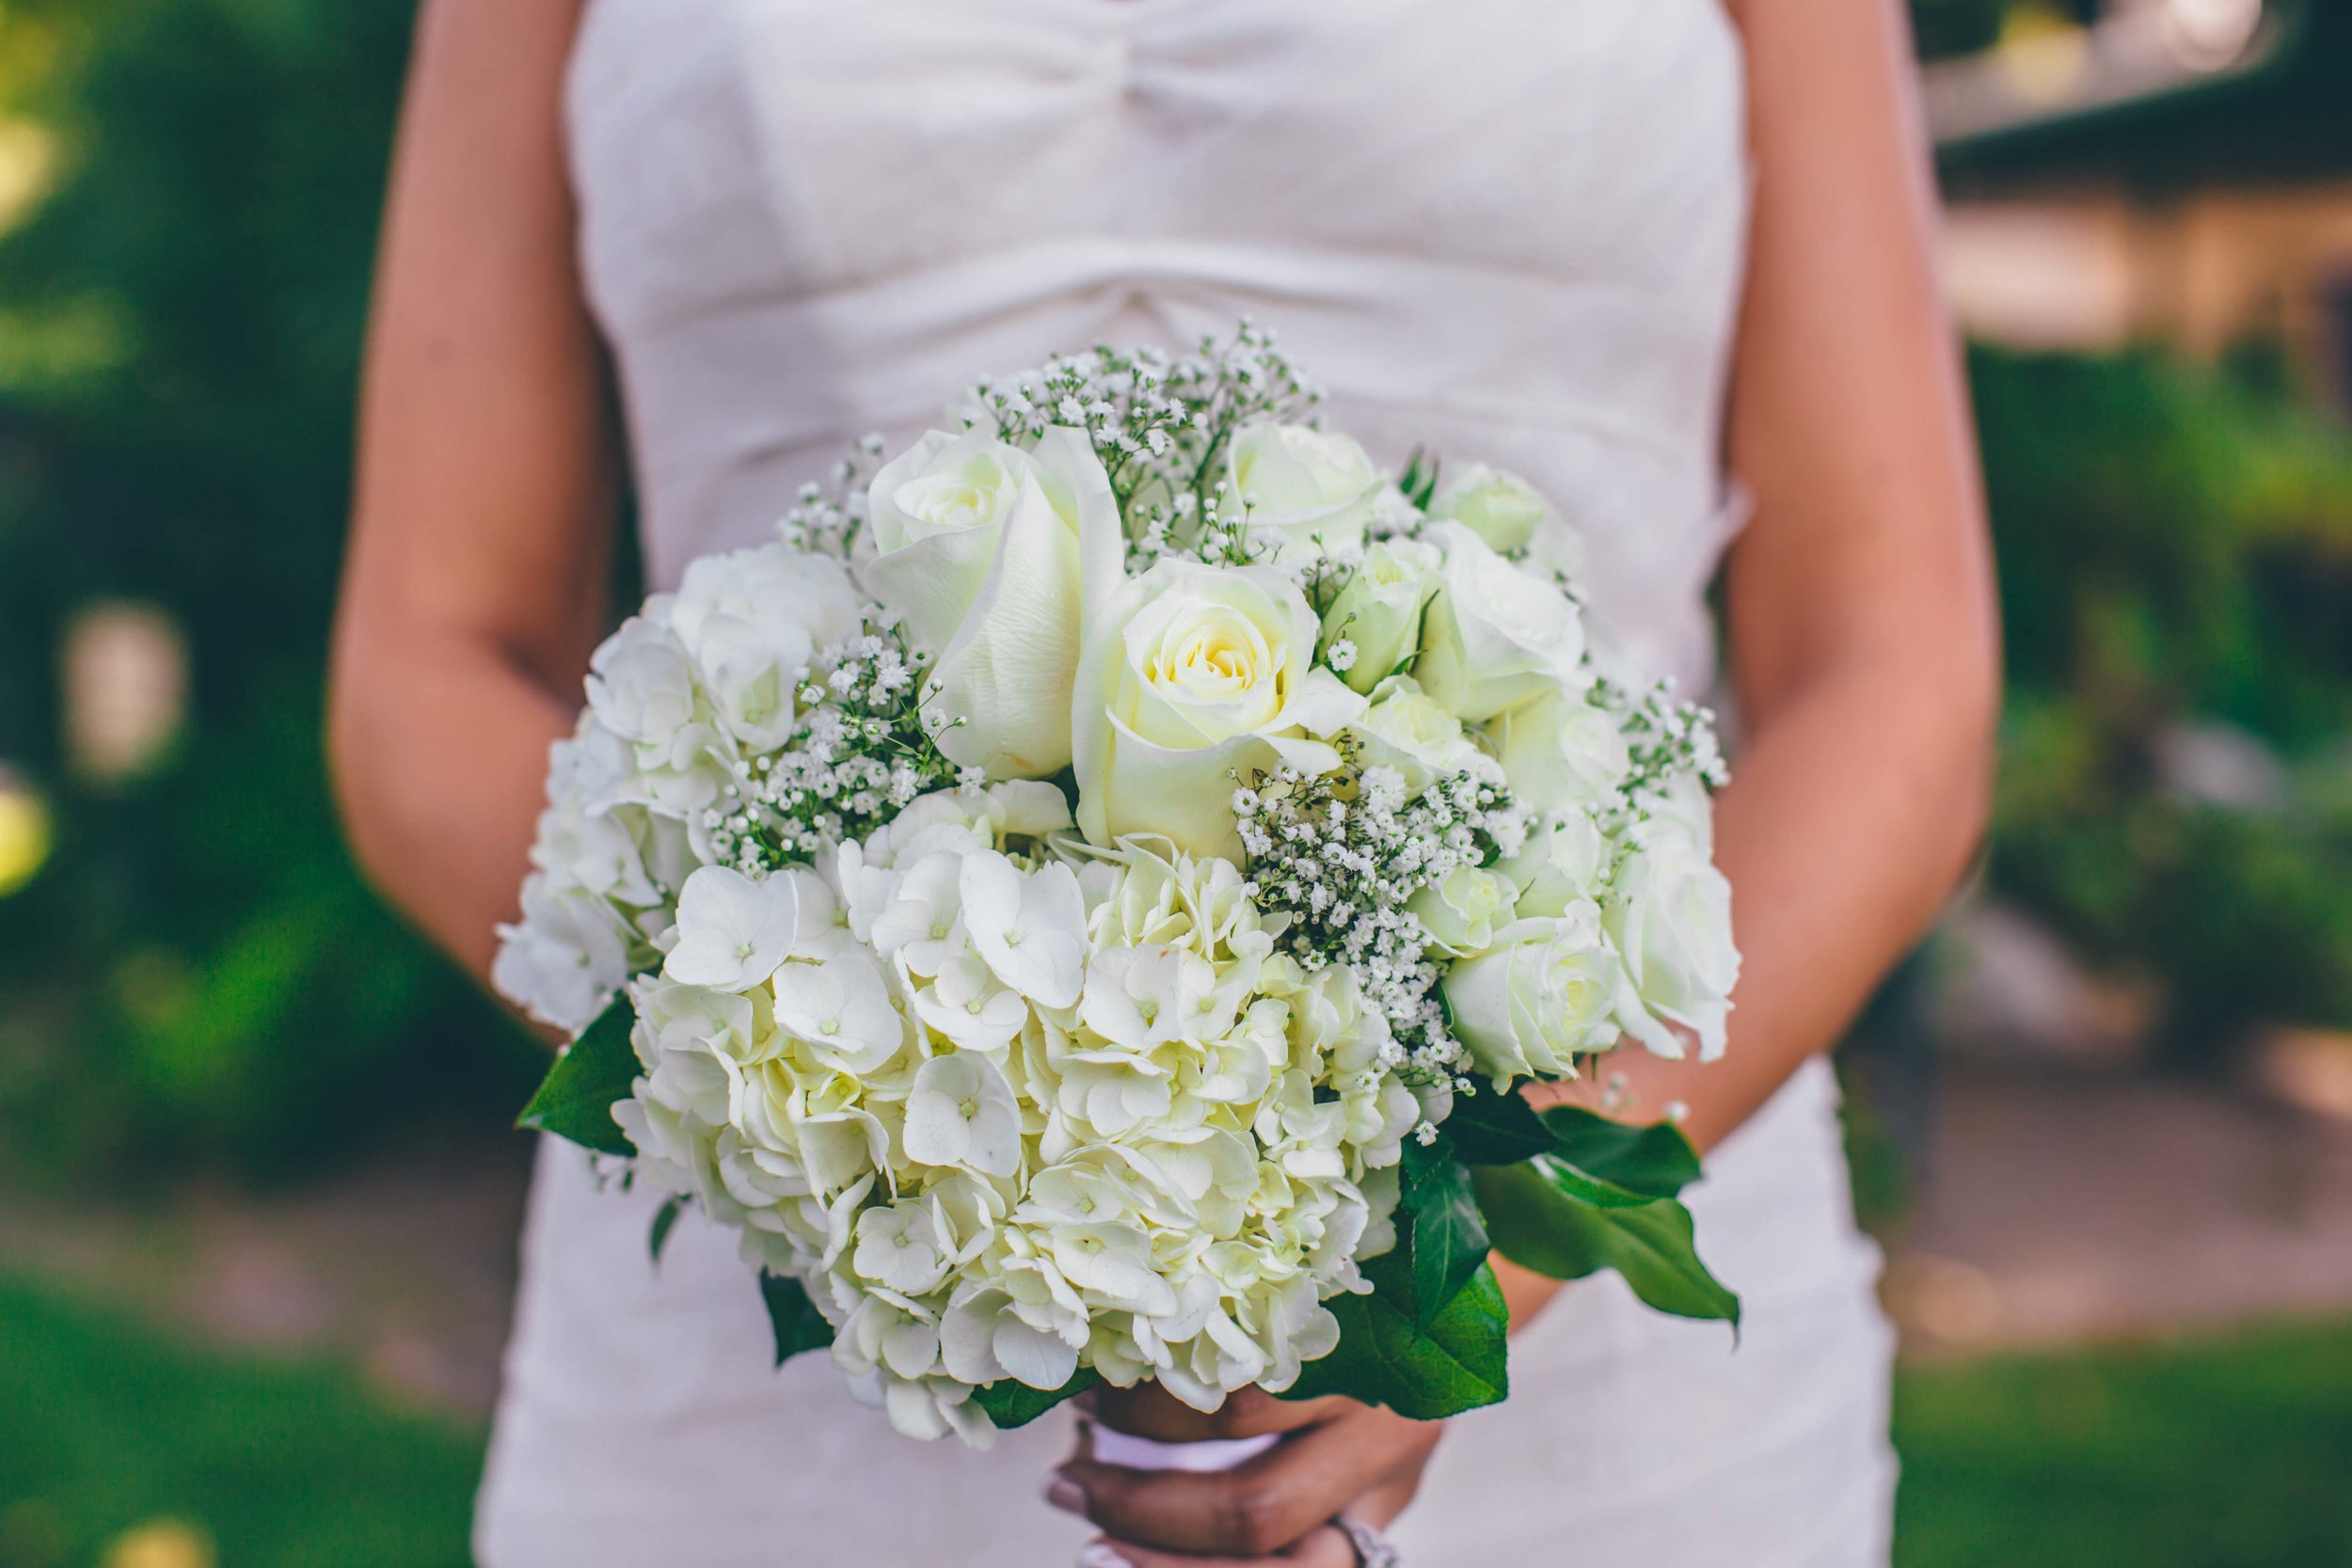 APavone-Photographer-Orange-County-Diamond-Bar-Wedding-043.jpg